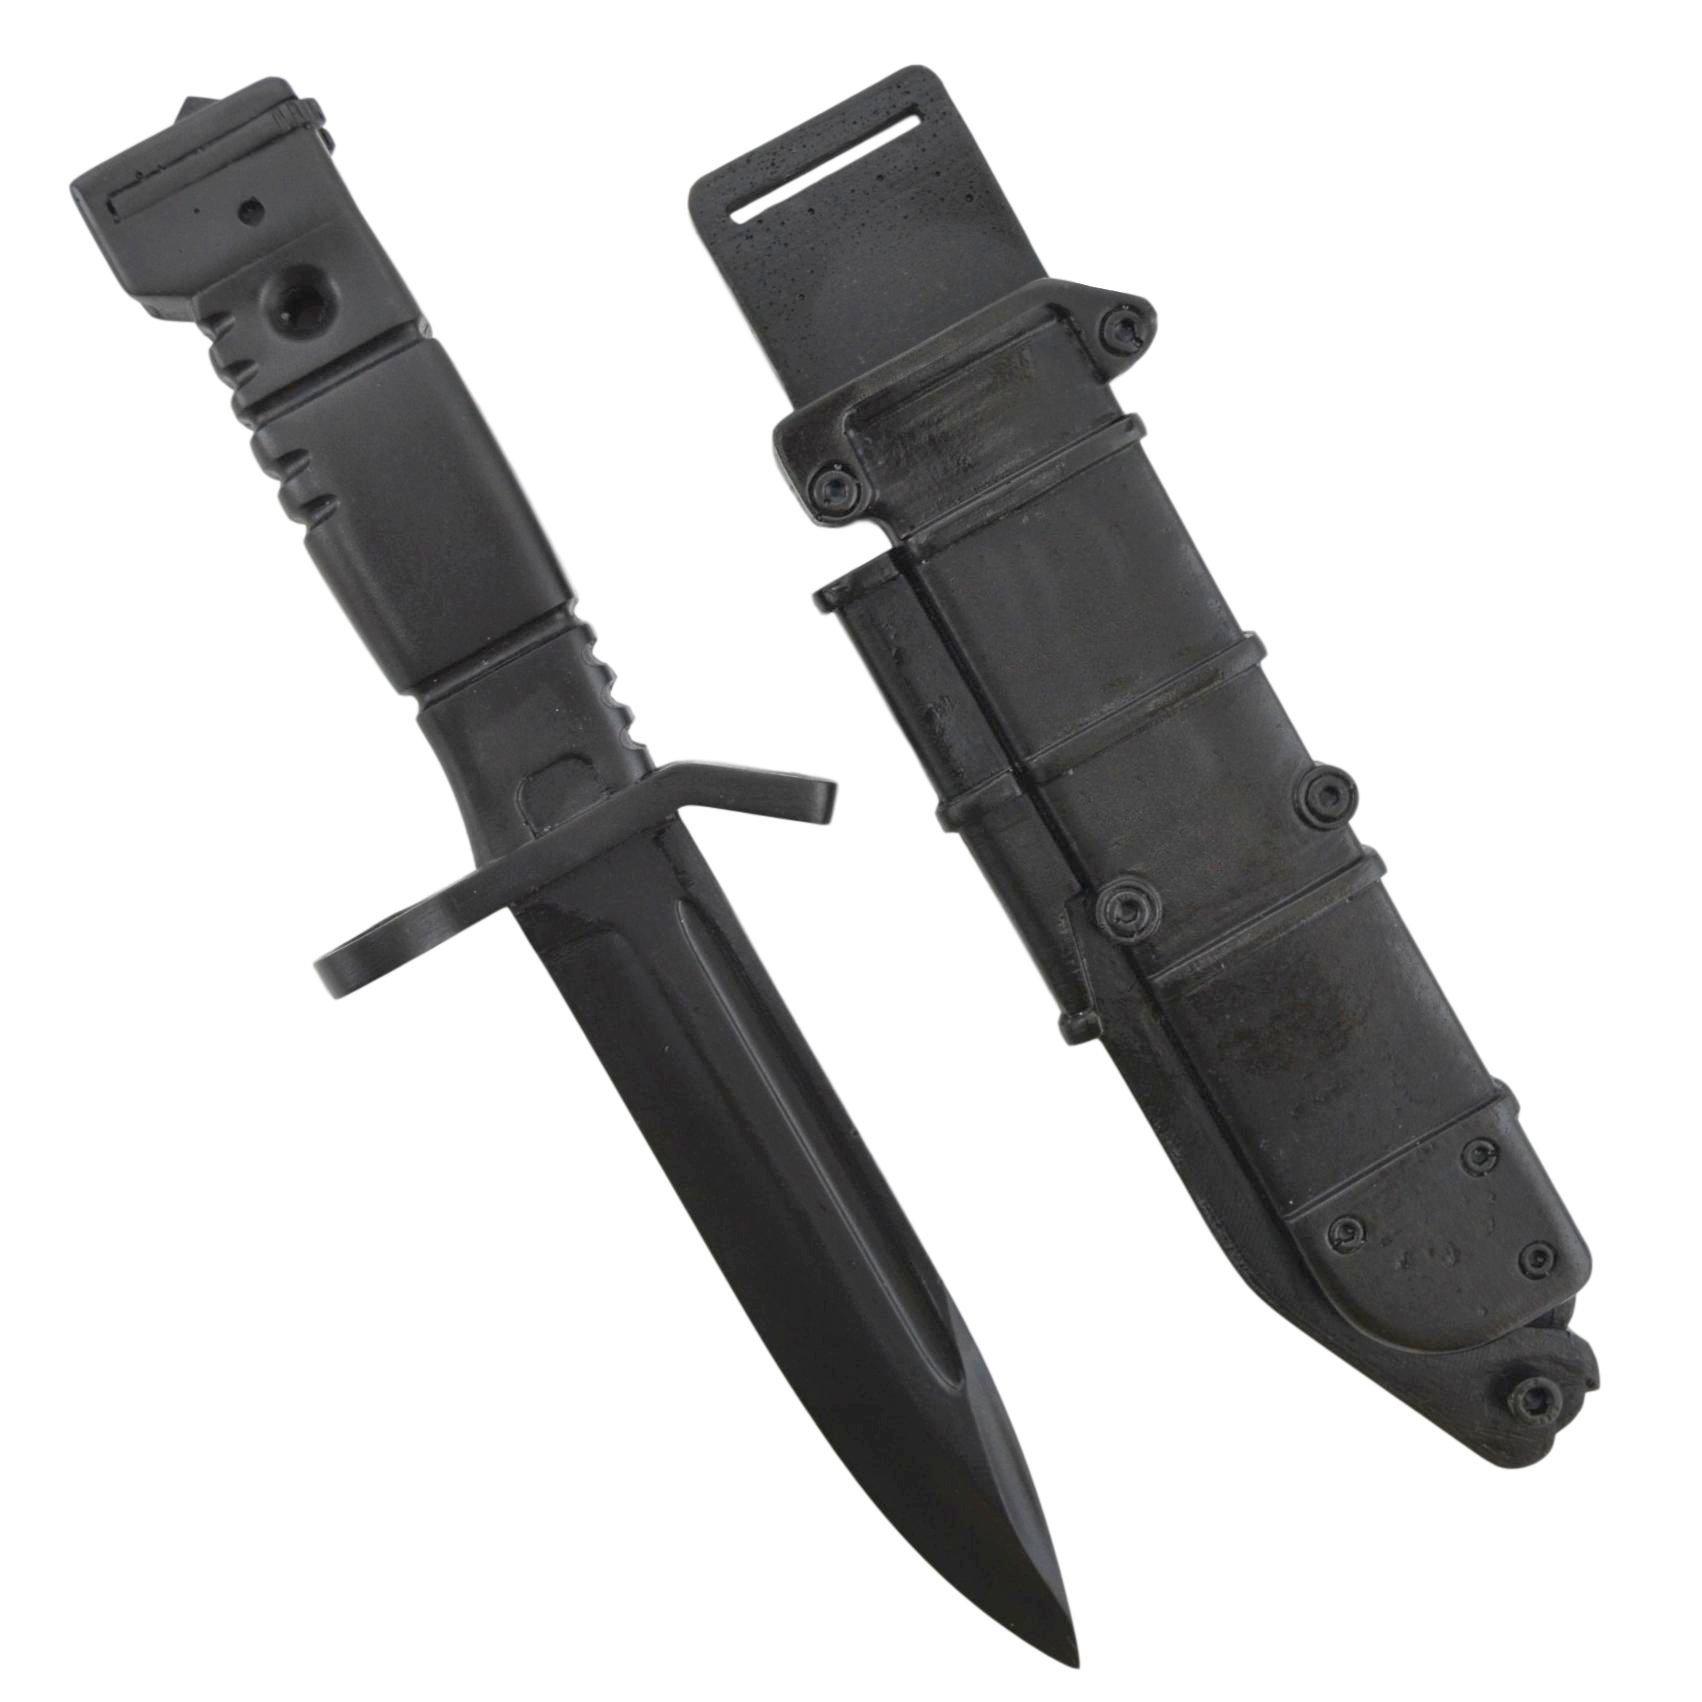 Ratnik Bayonet AK 6x9 Russian Army Training Knife Replica